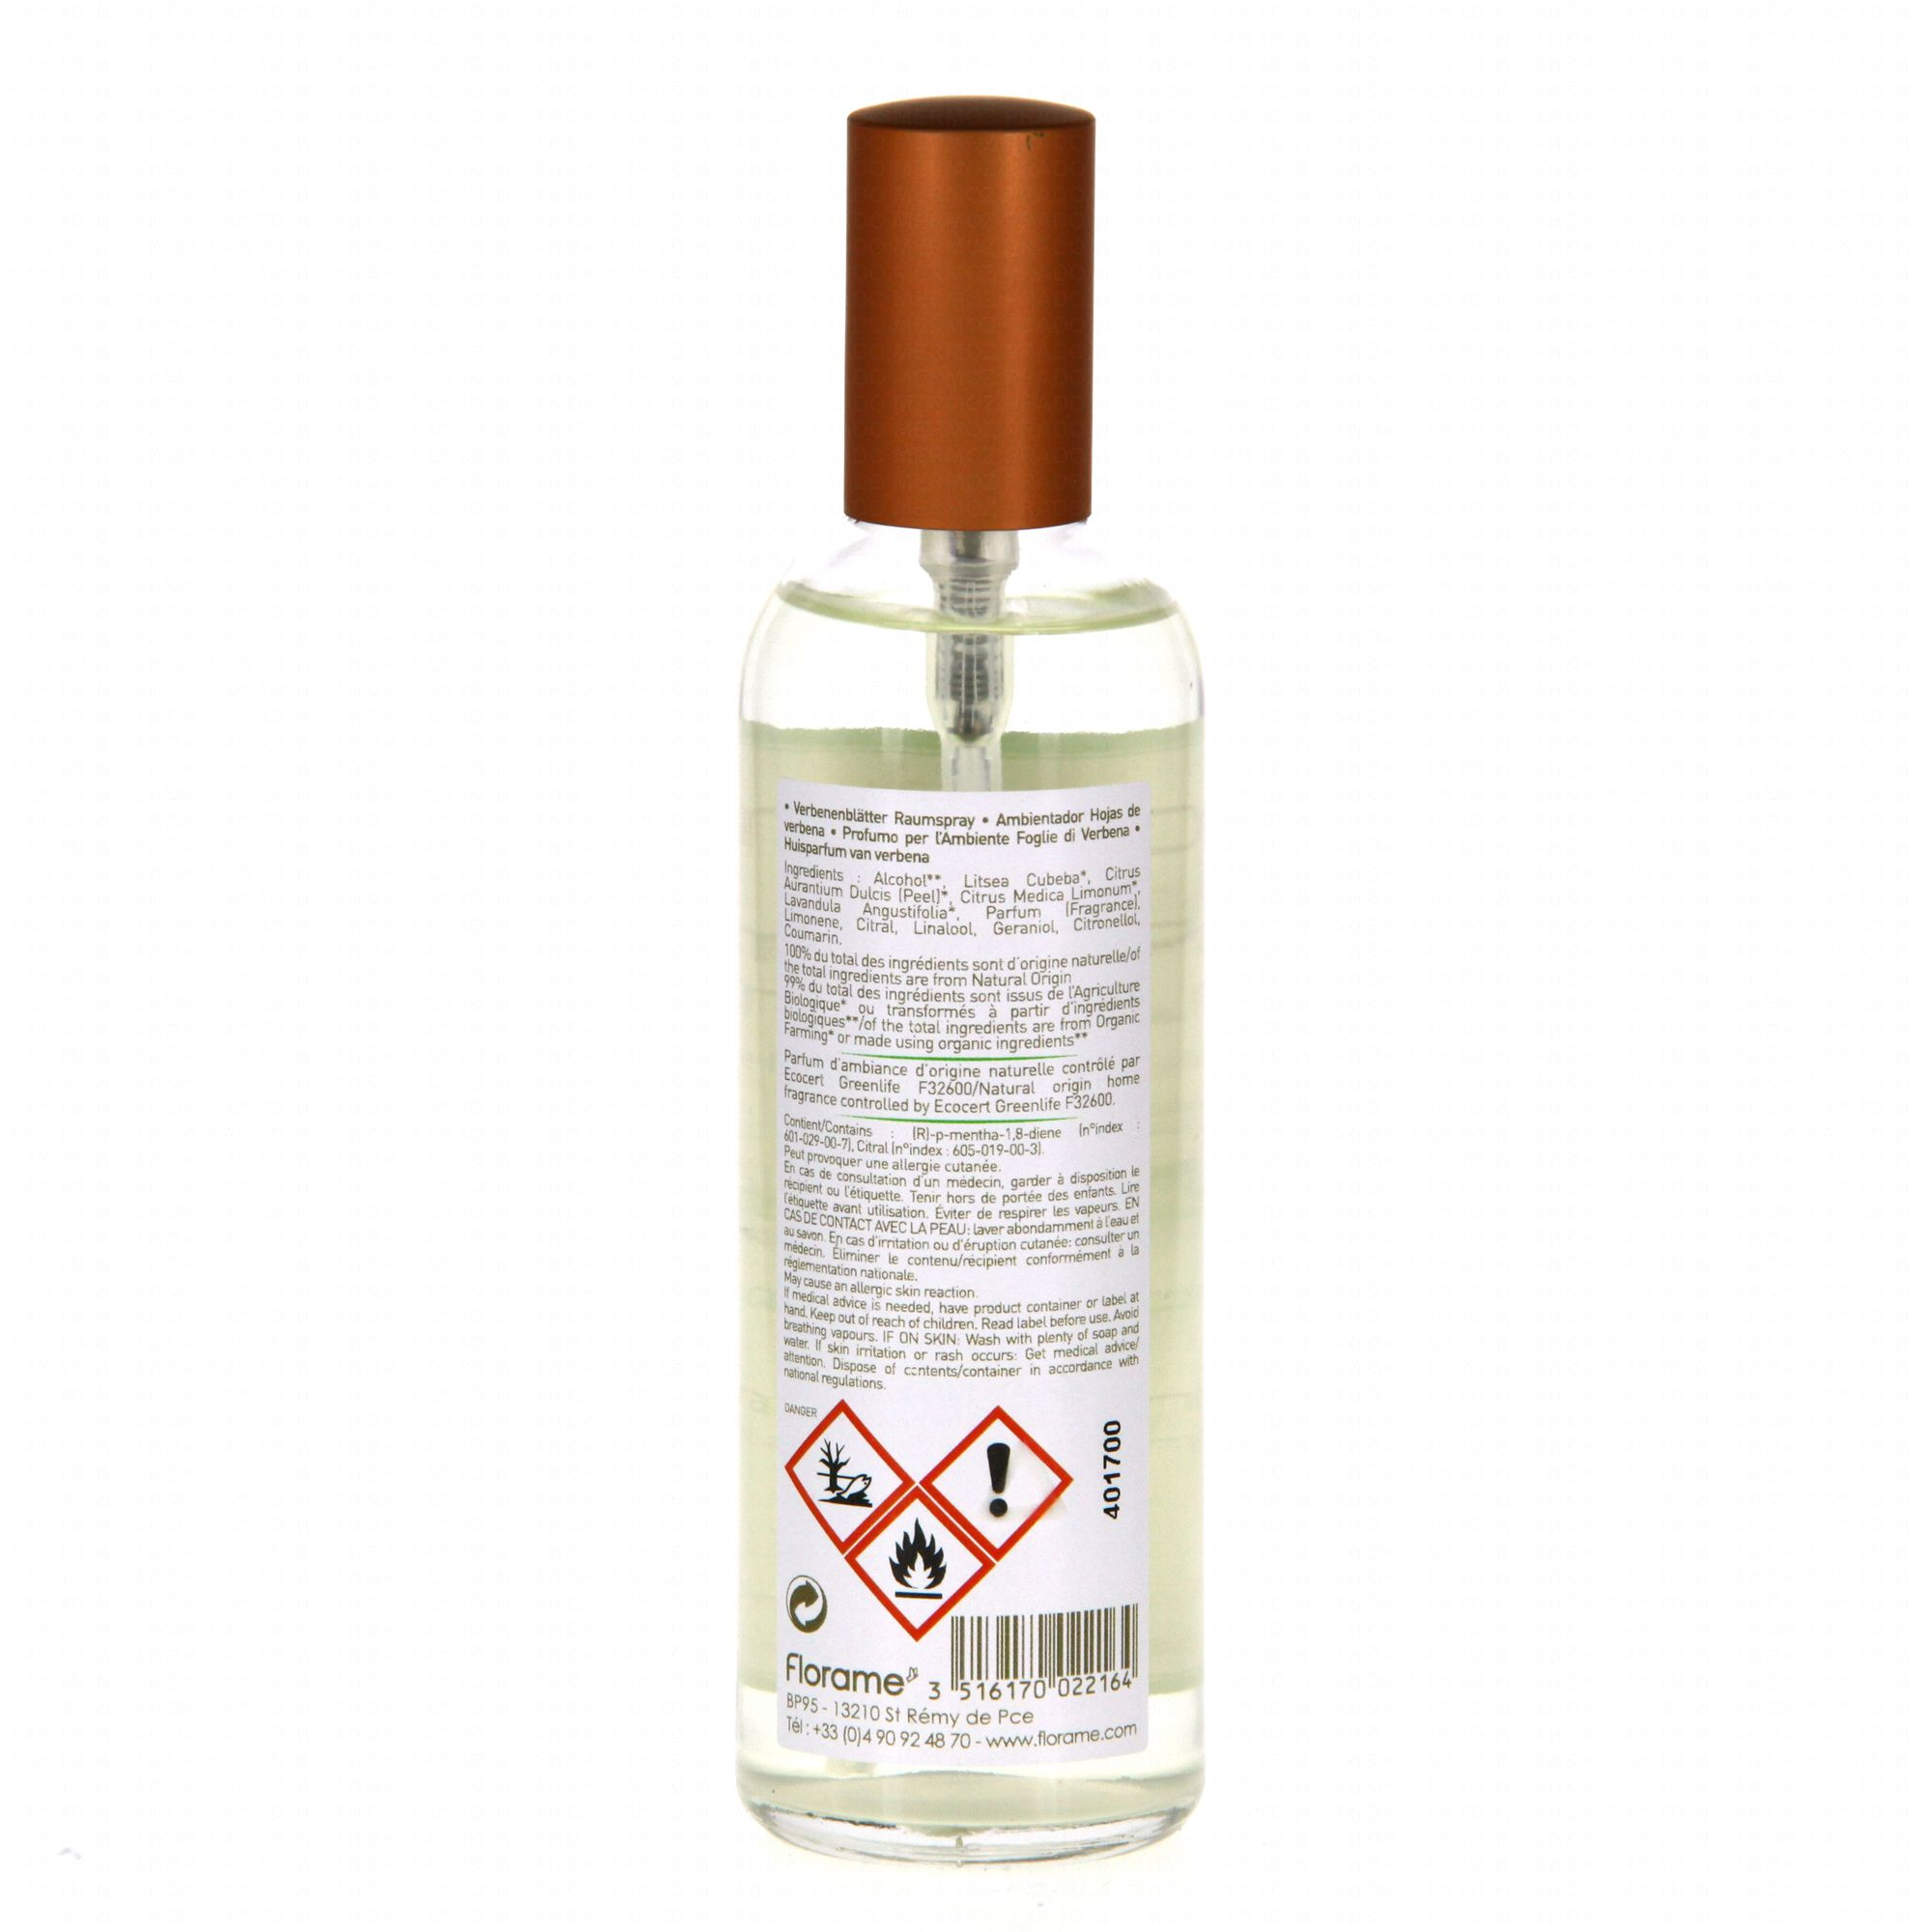 florame parfum d 39 ambiance feuille de verveine flacon 100ml parapharmacie en ligne prado mermoz. Black Bedroom Furniture Sets. Home Design Ideas